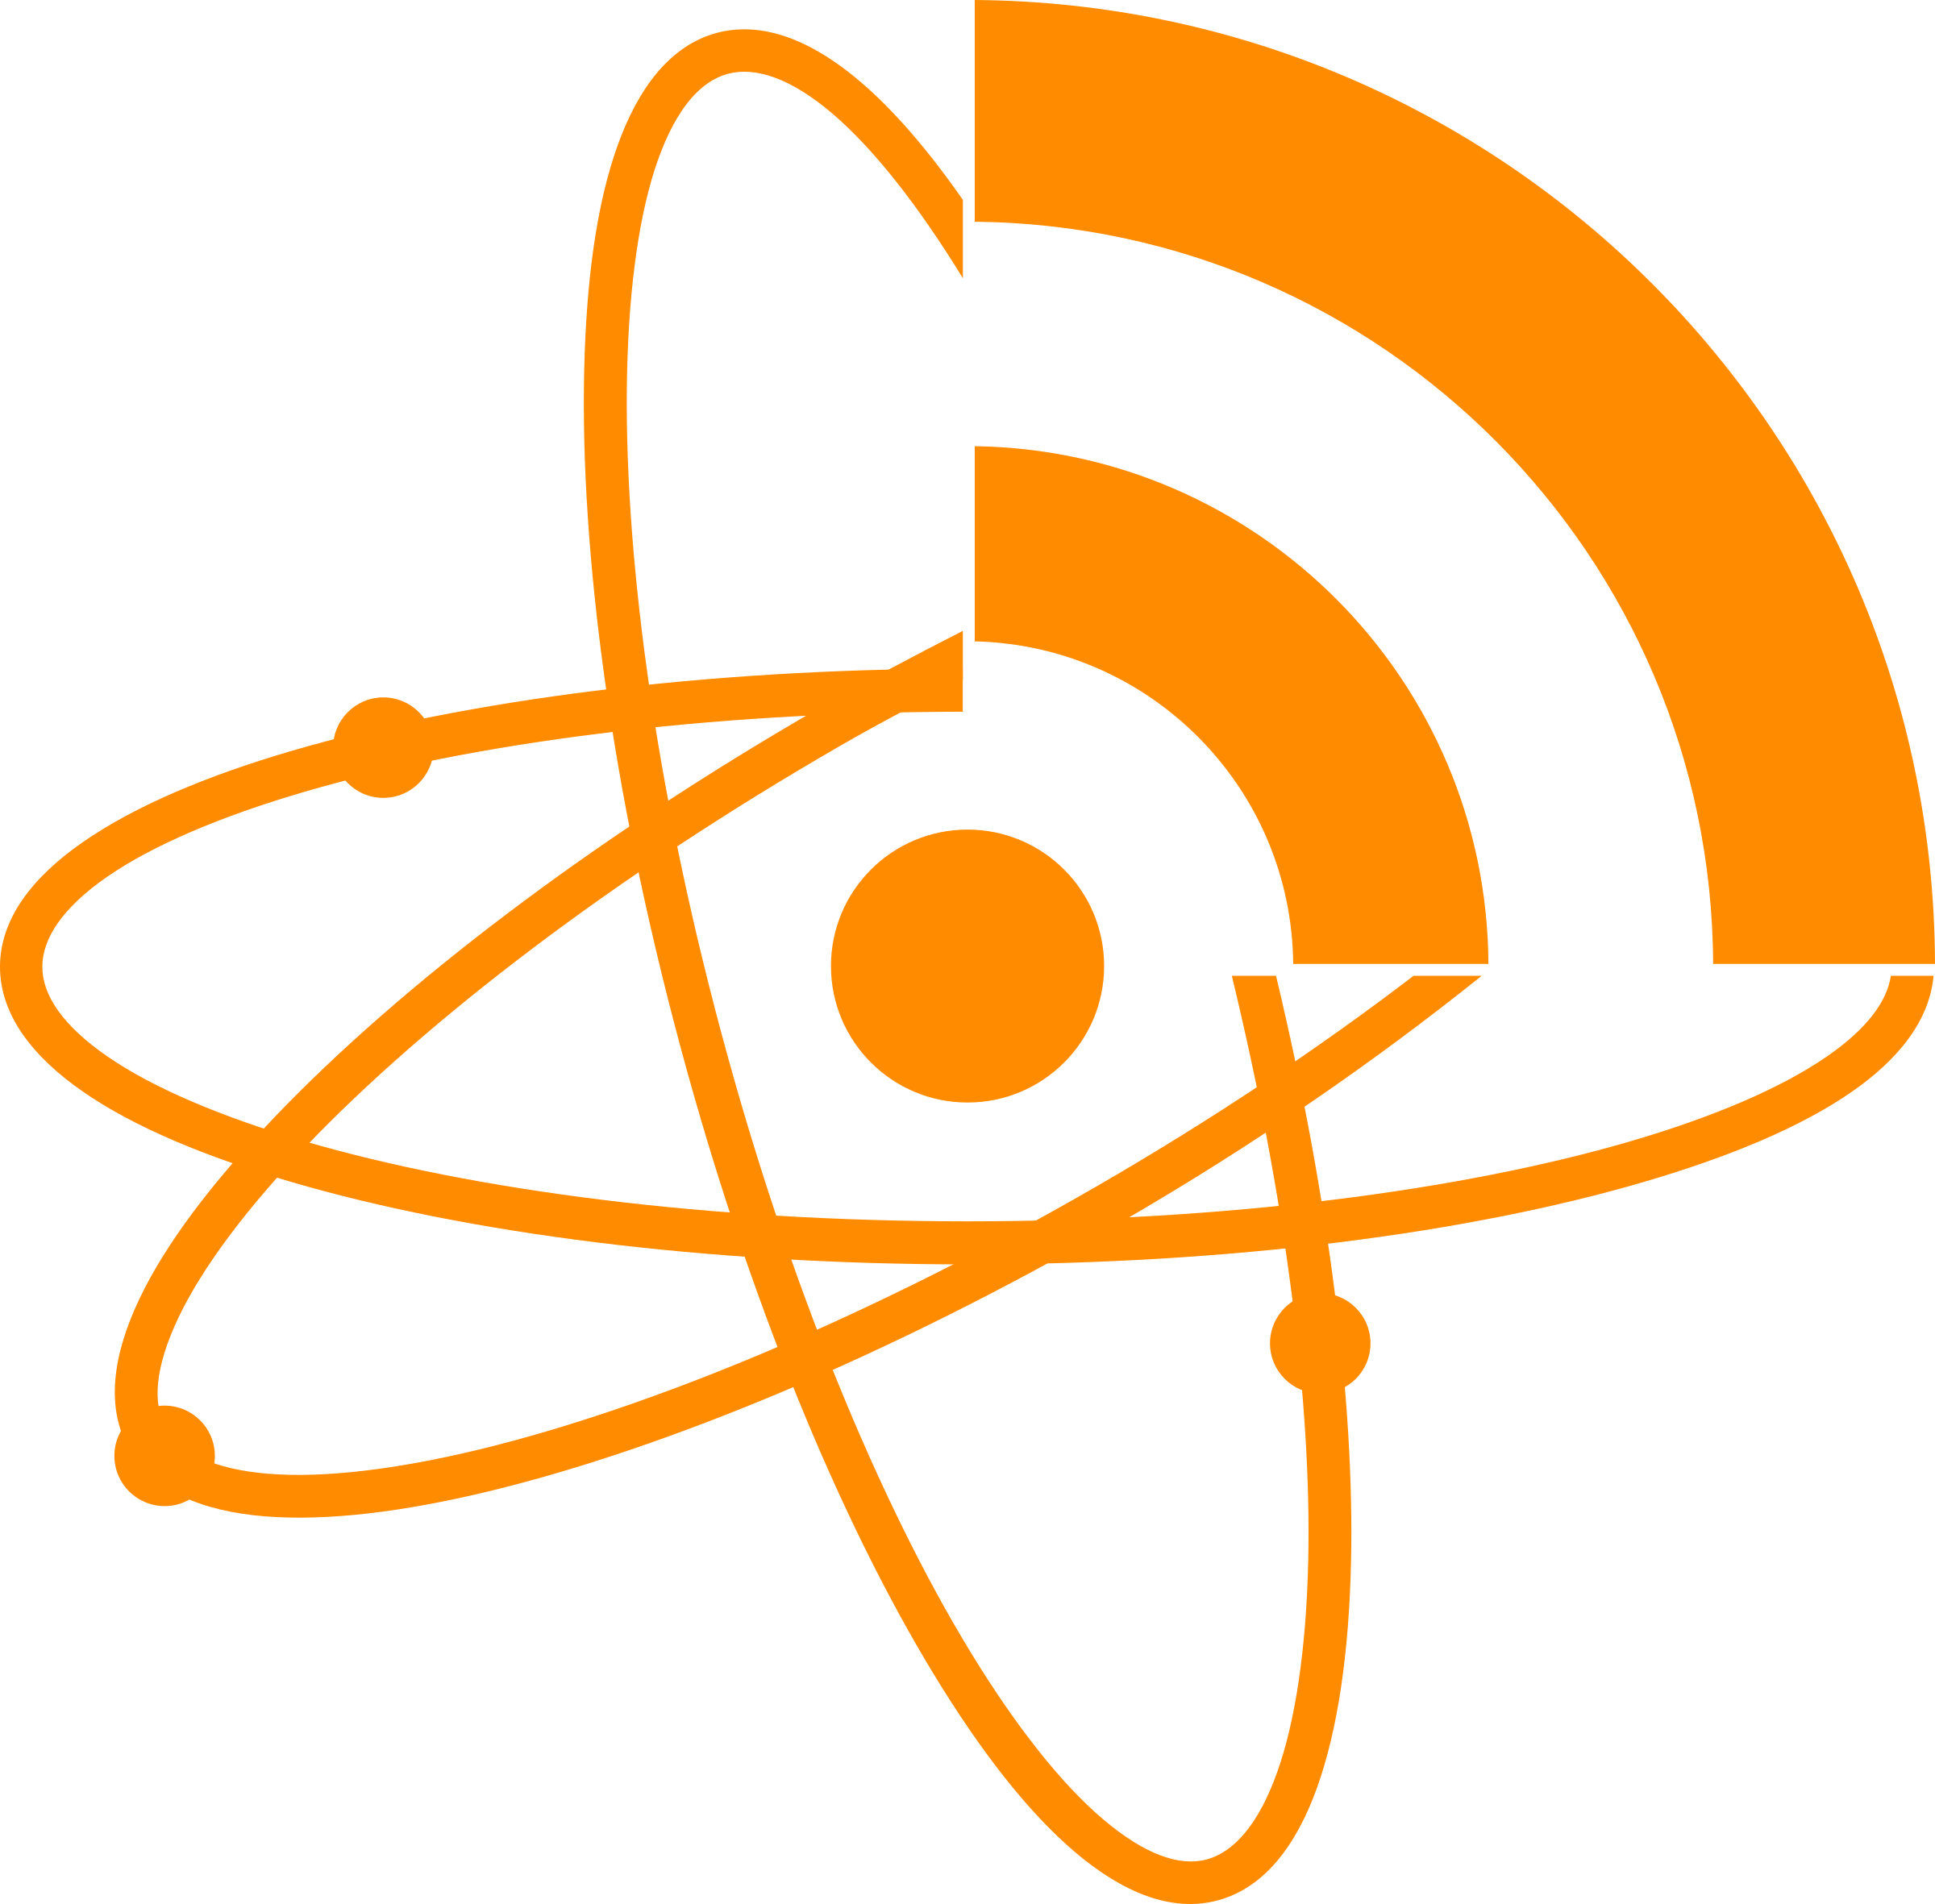 Feeds icon big image. Atom clipart orange